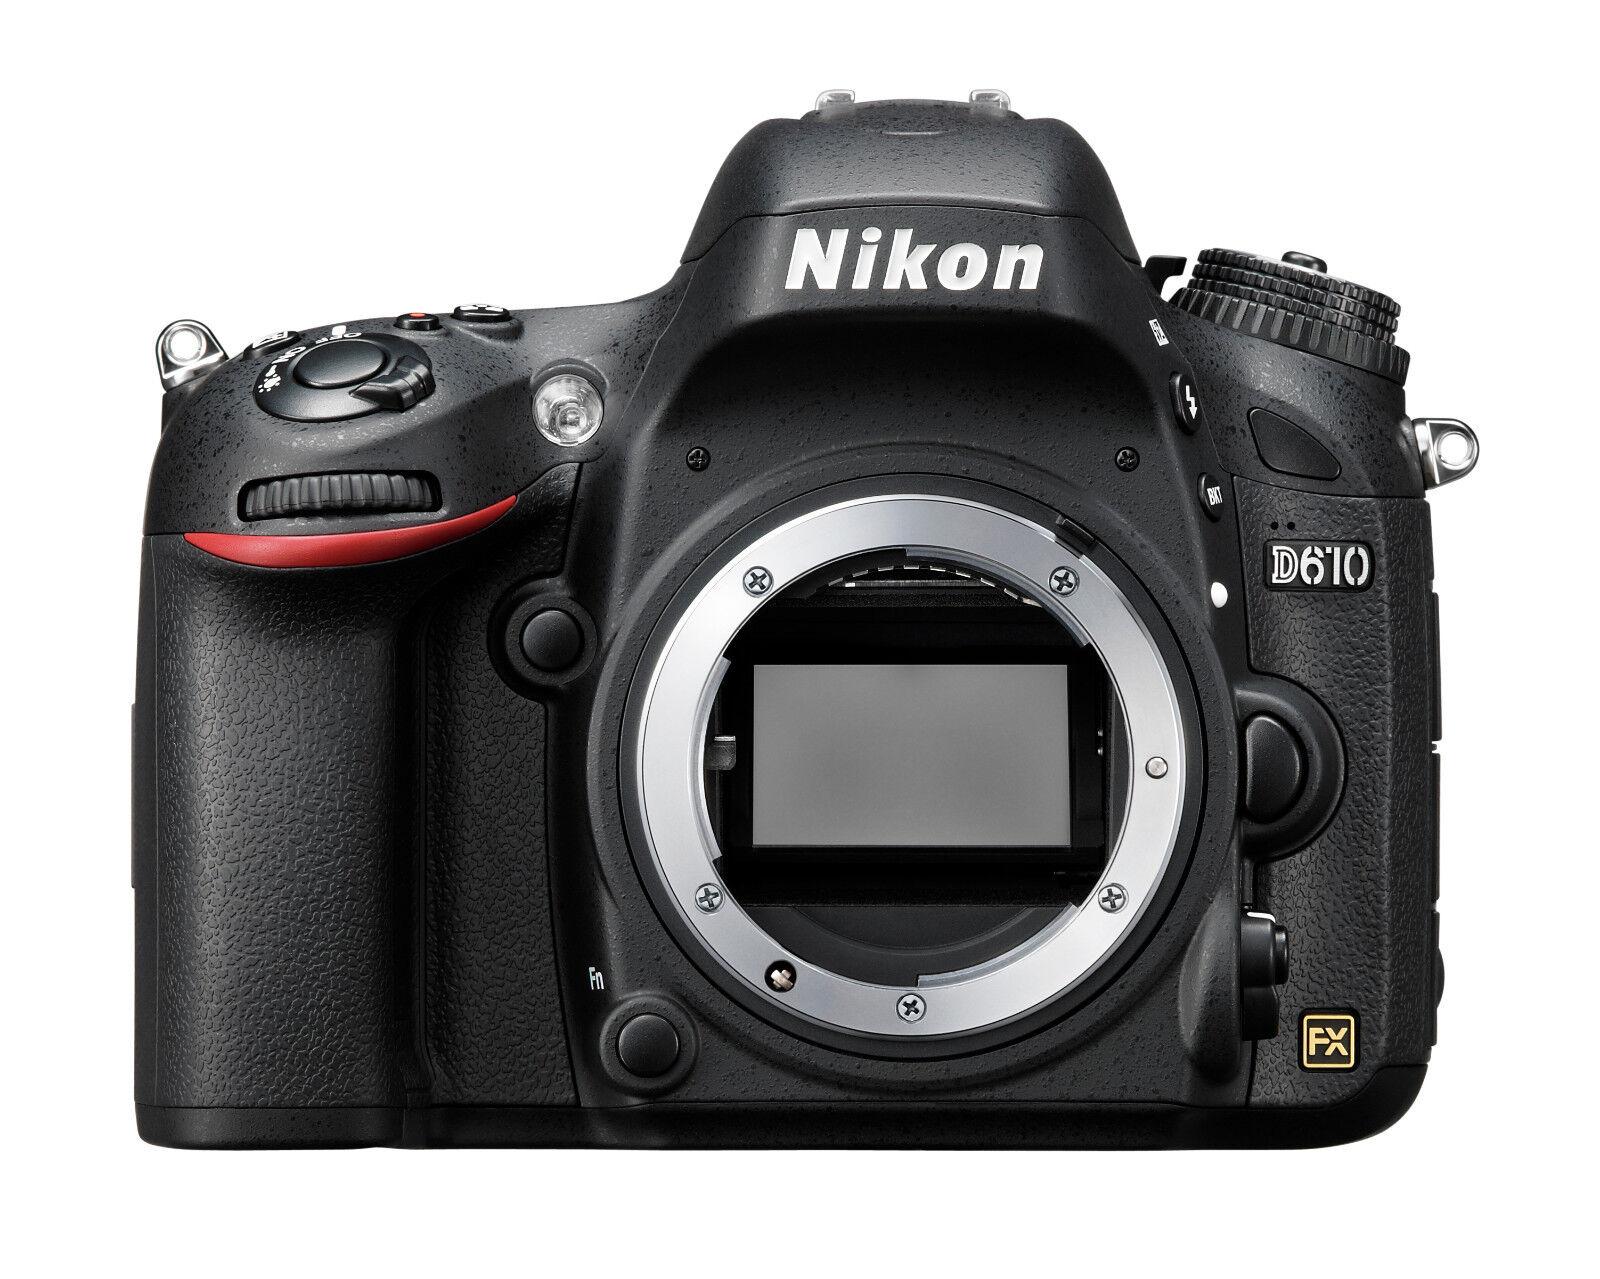 Spiegelreflexkamera Nikon D610 24.3 MP DSLR, GEHÄUSE, DEMOWARE